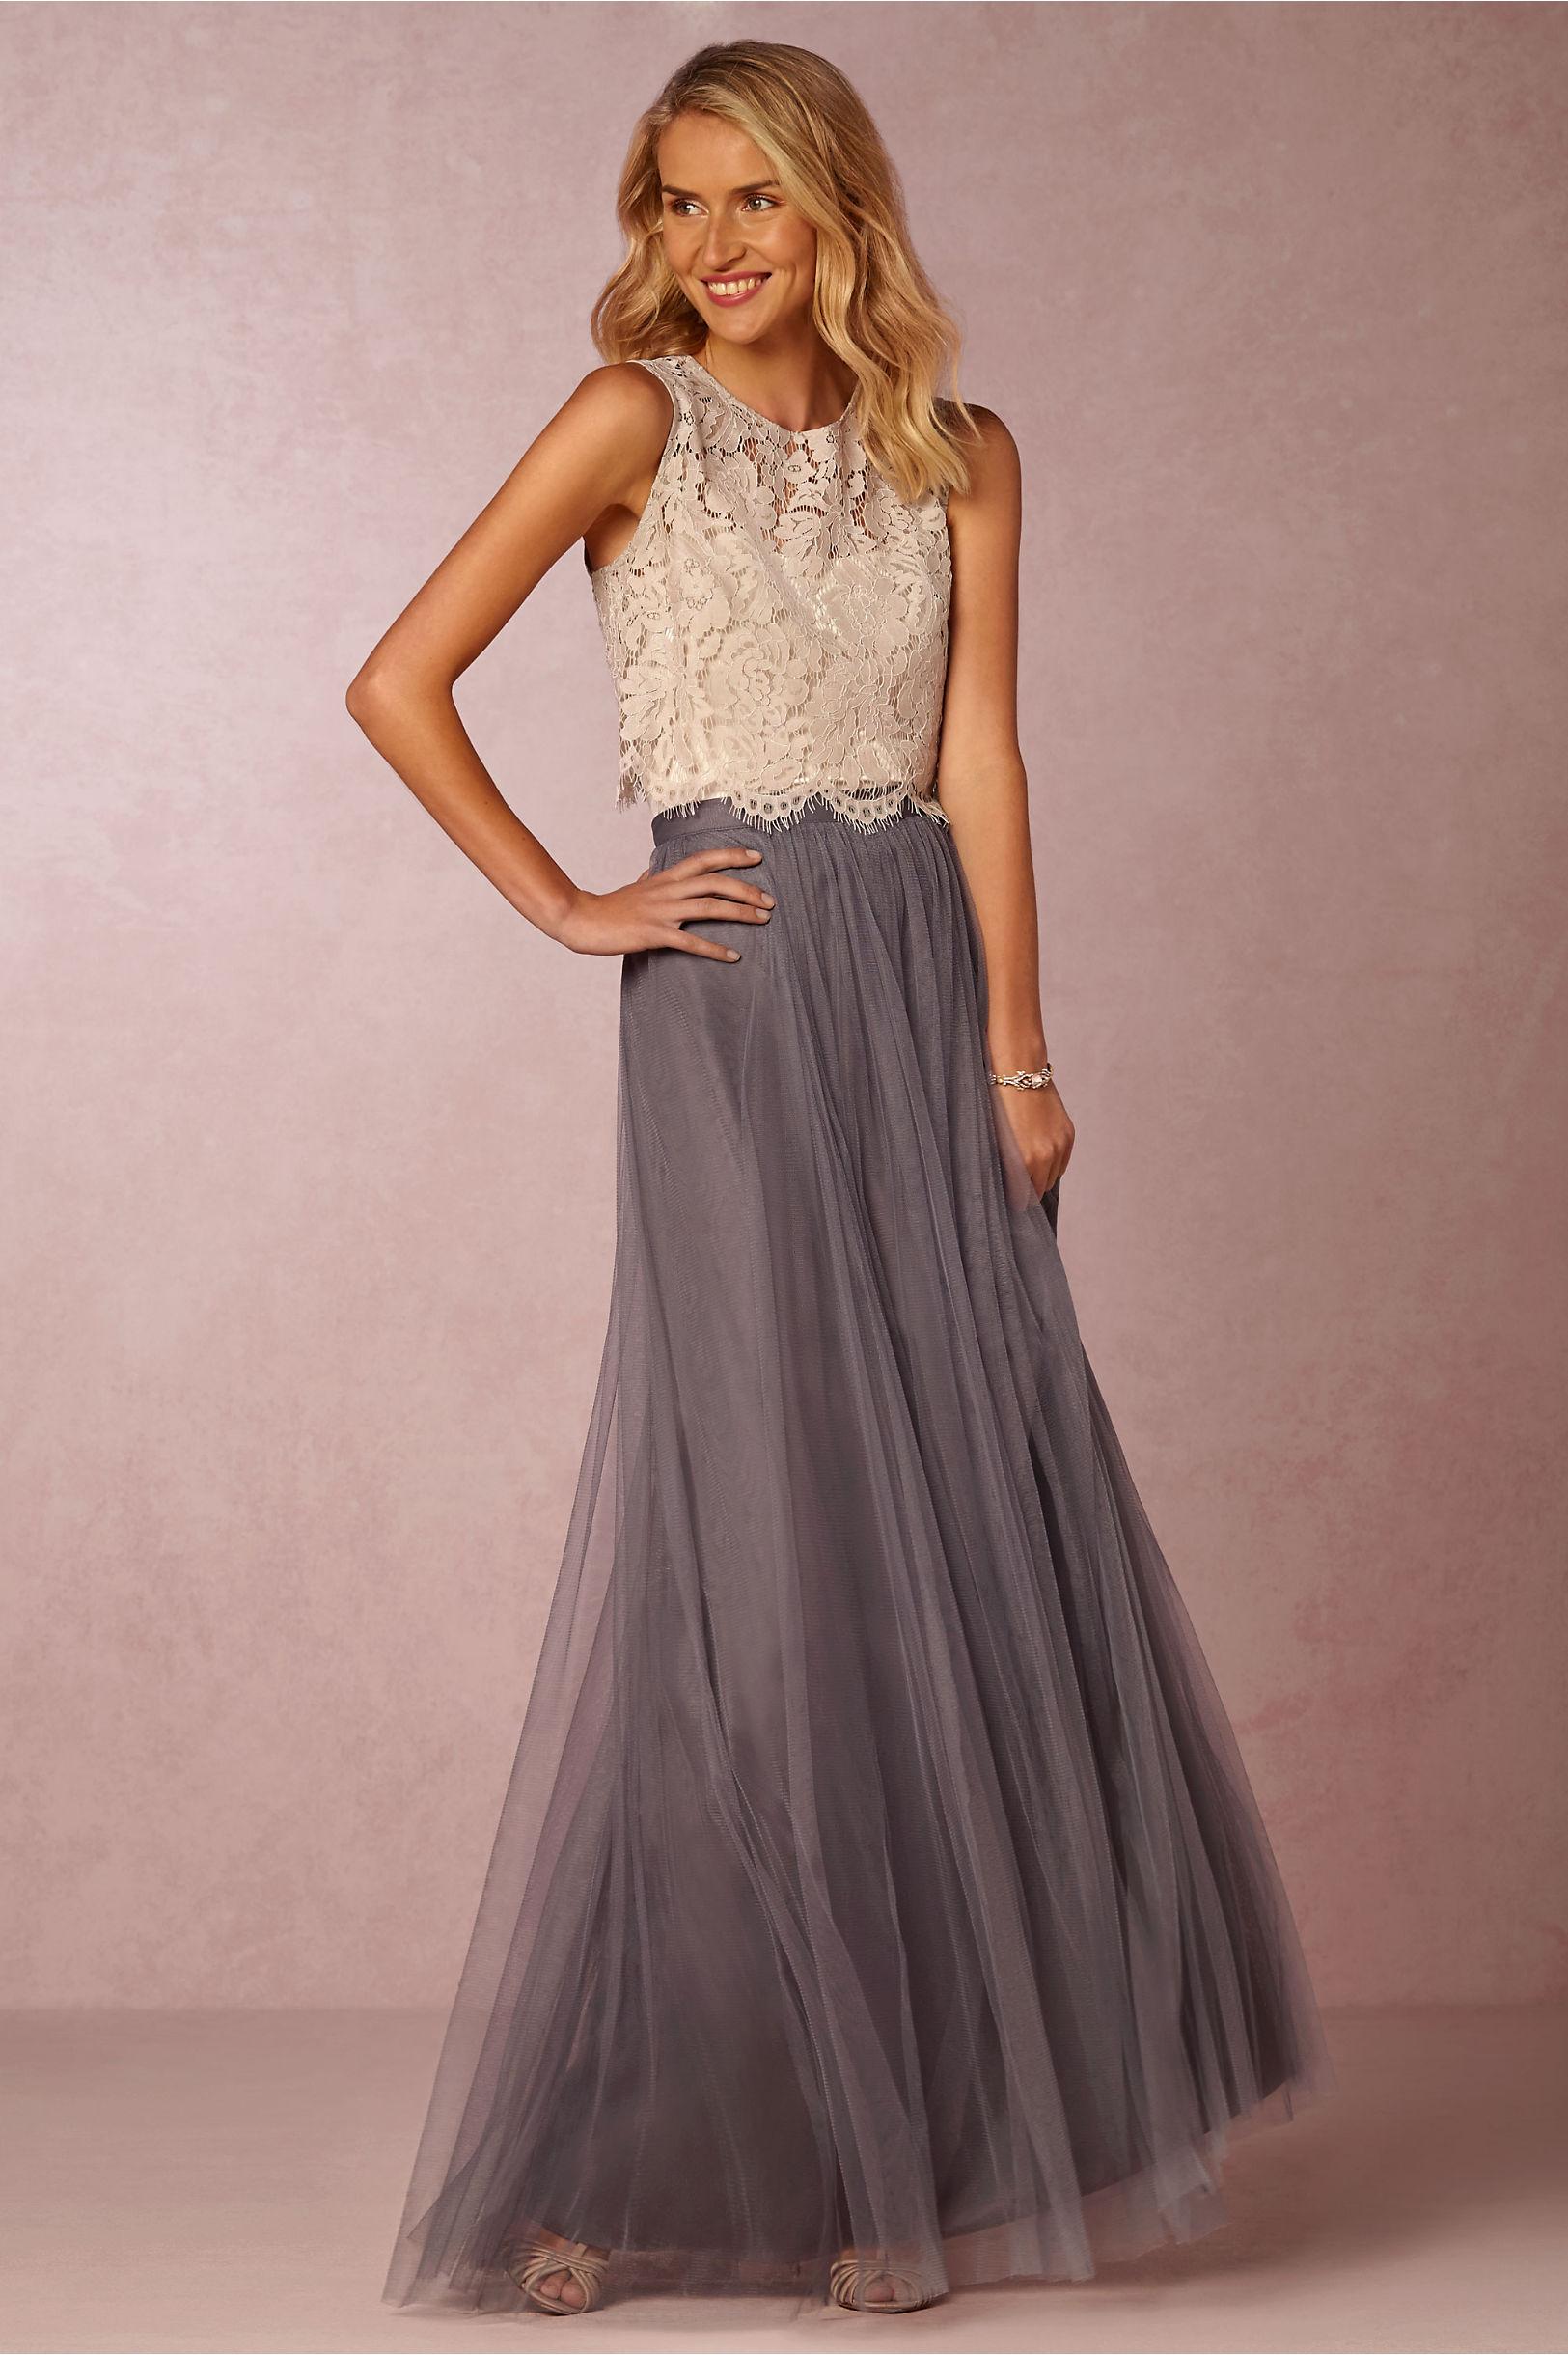 Lace Bridesmaid Dresses | Long & Short Styles | BHLDN